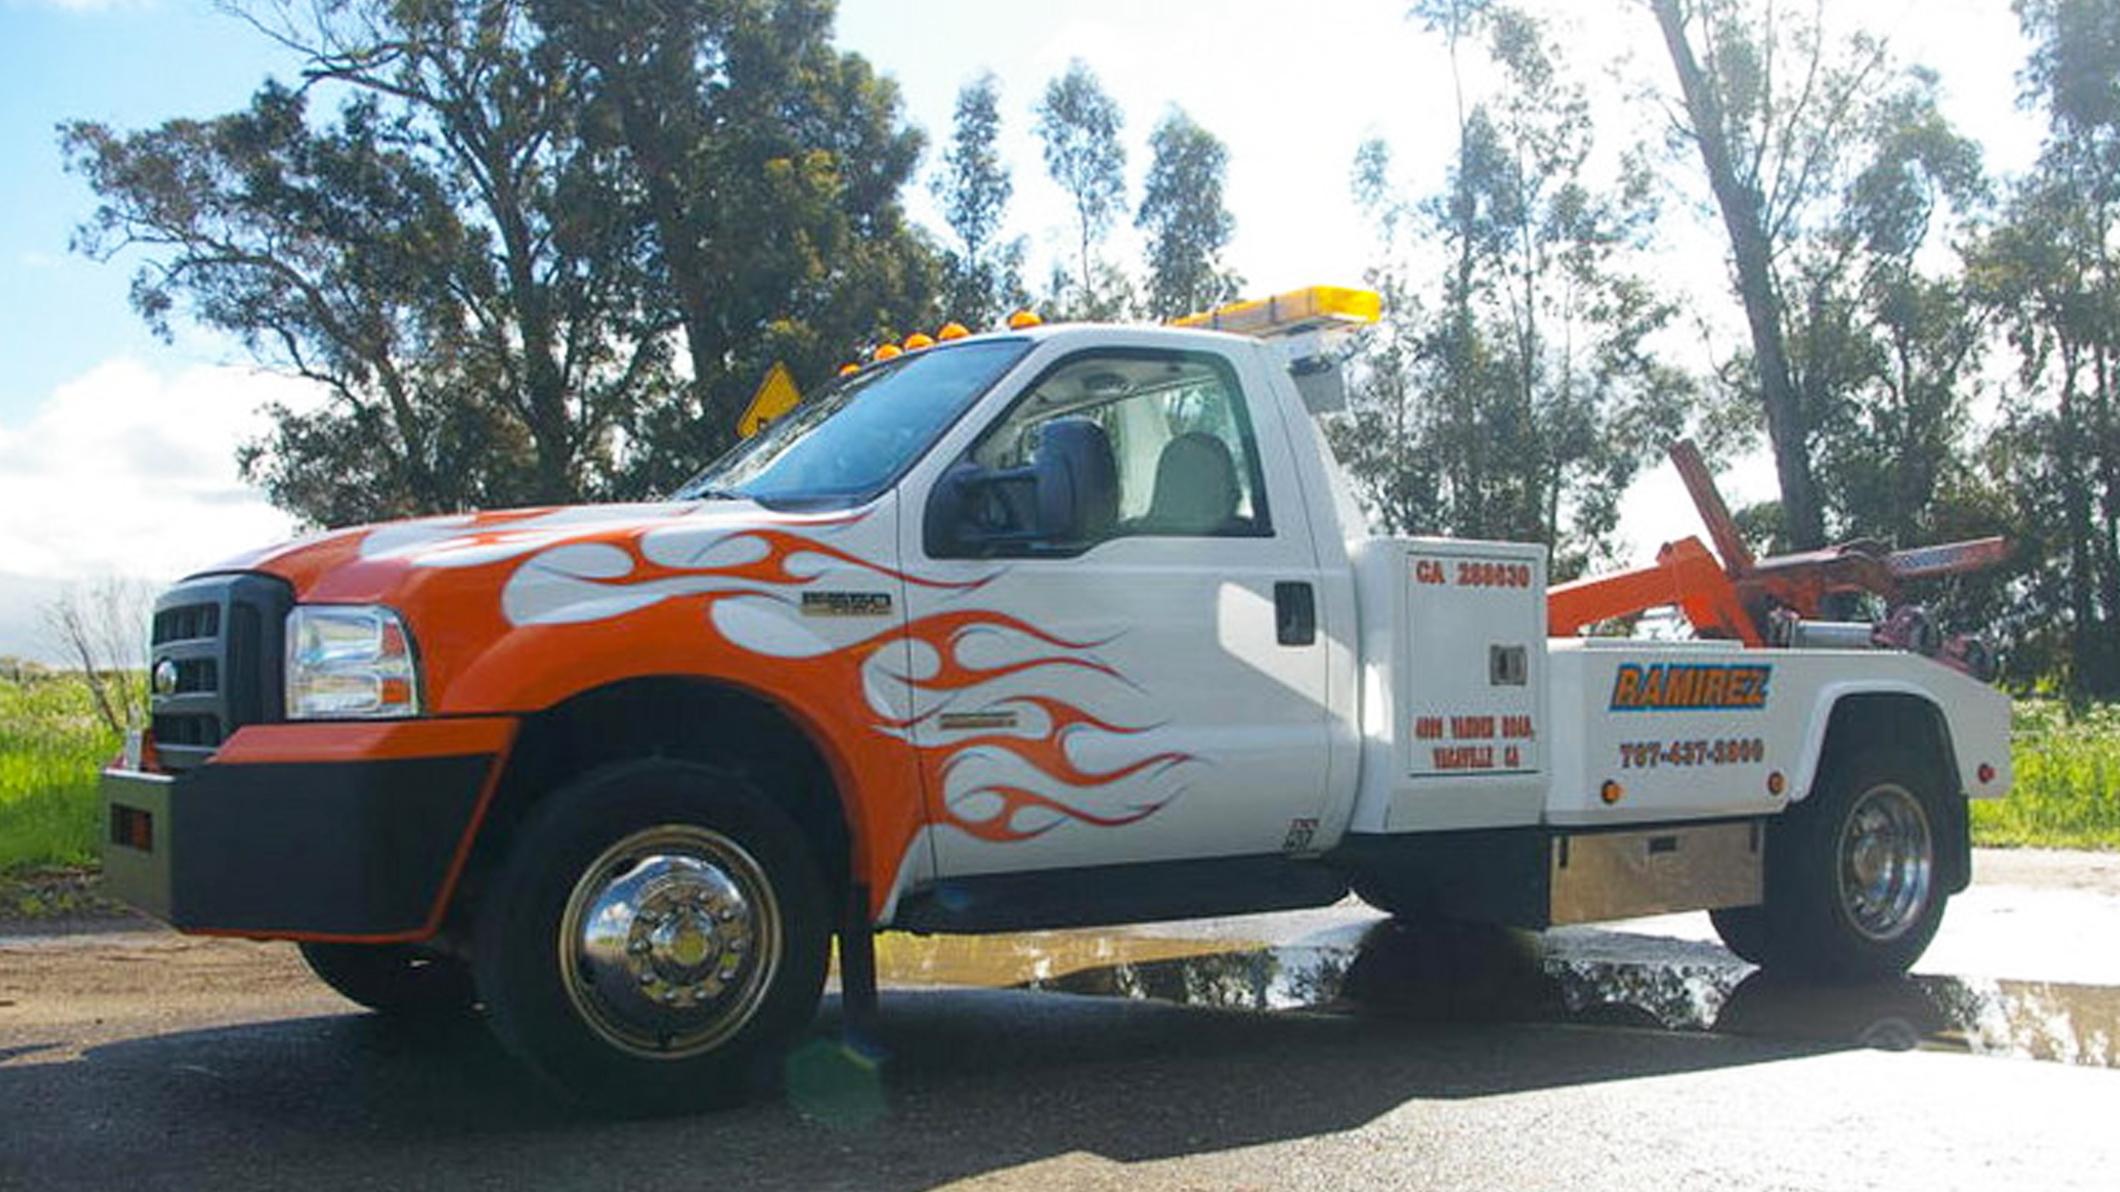 Jeff Ramirez Towing - Fairfield, CA 94533 - (707)437-2800 | ShowMeLocal.com